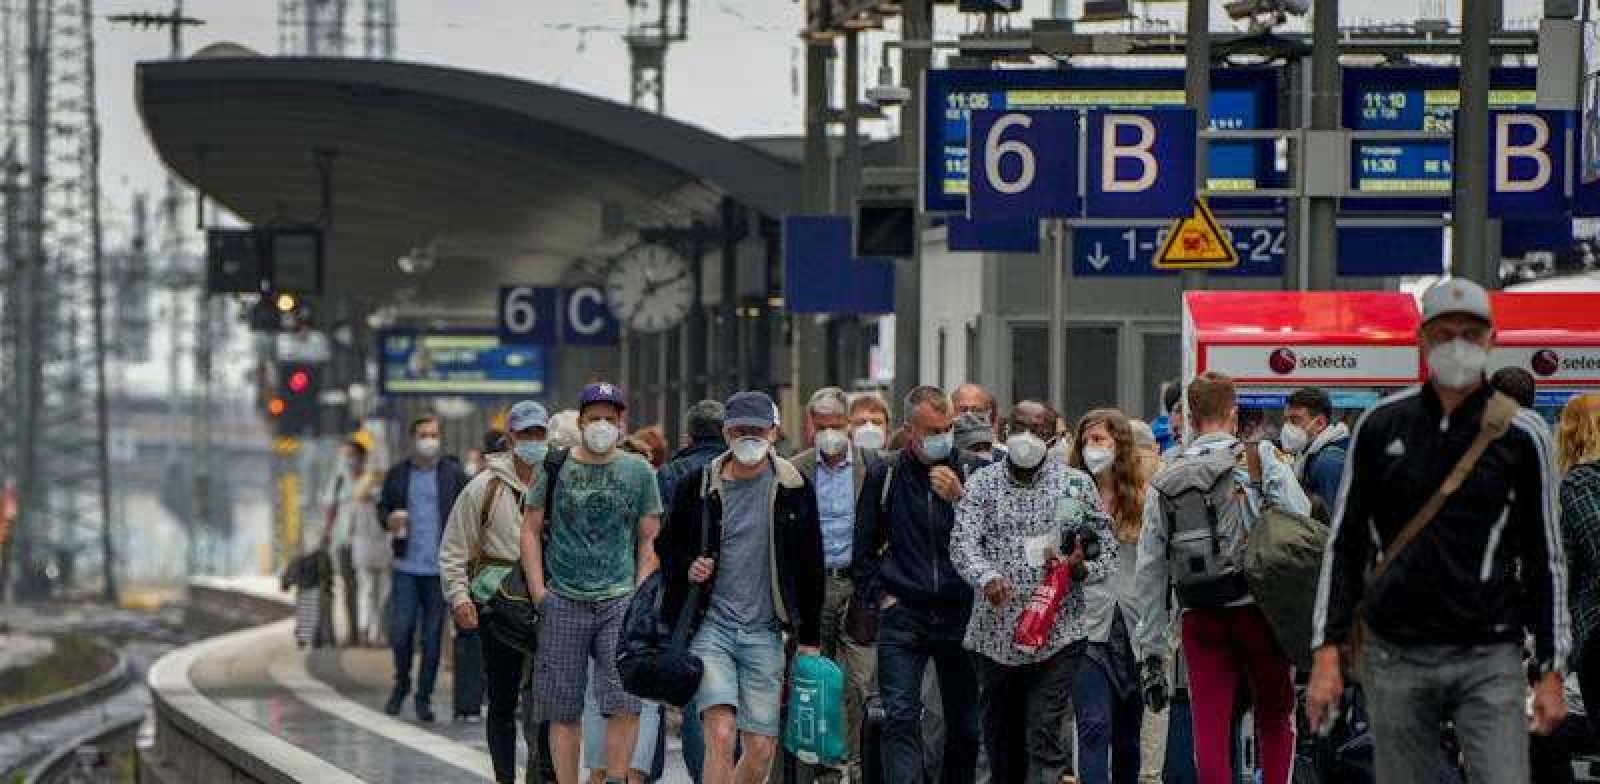 עוברי אורח בגרמניה / צילום: Associated Press, Michael Probst